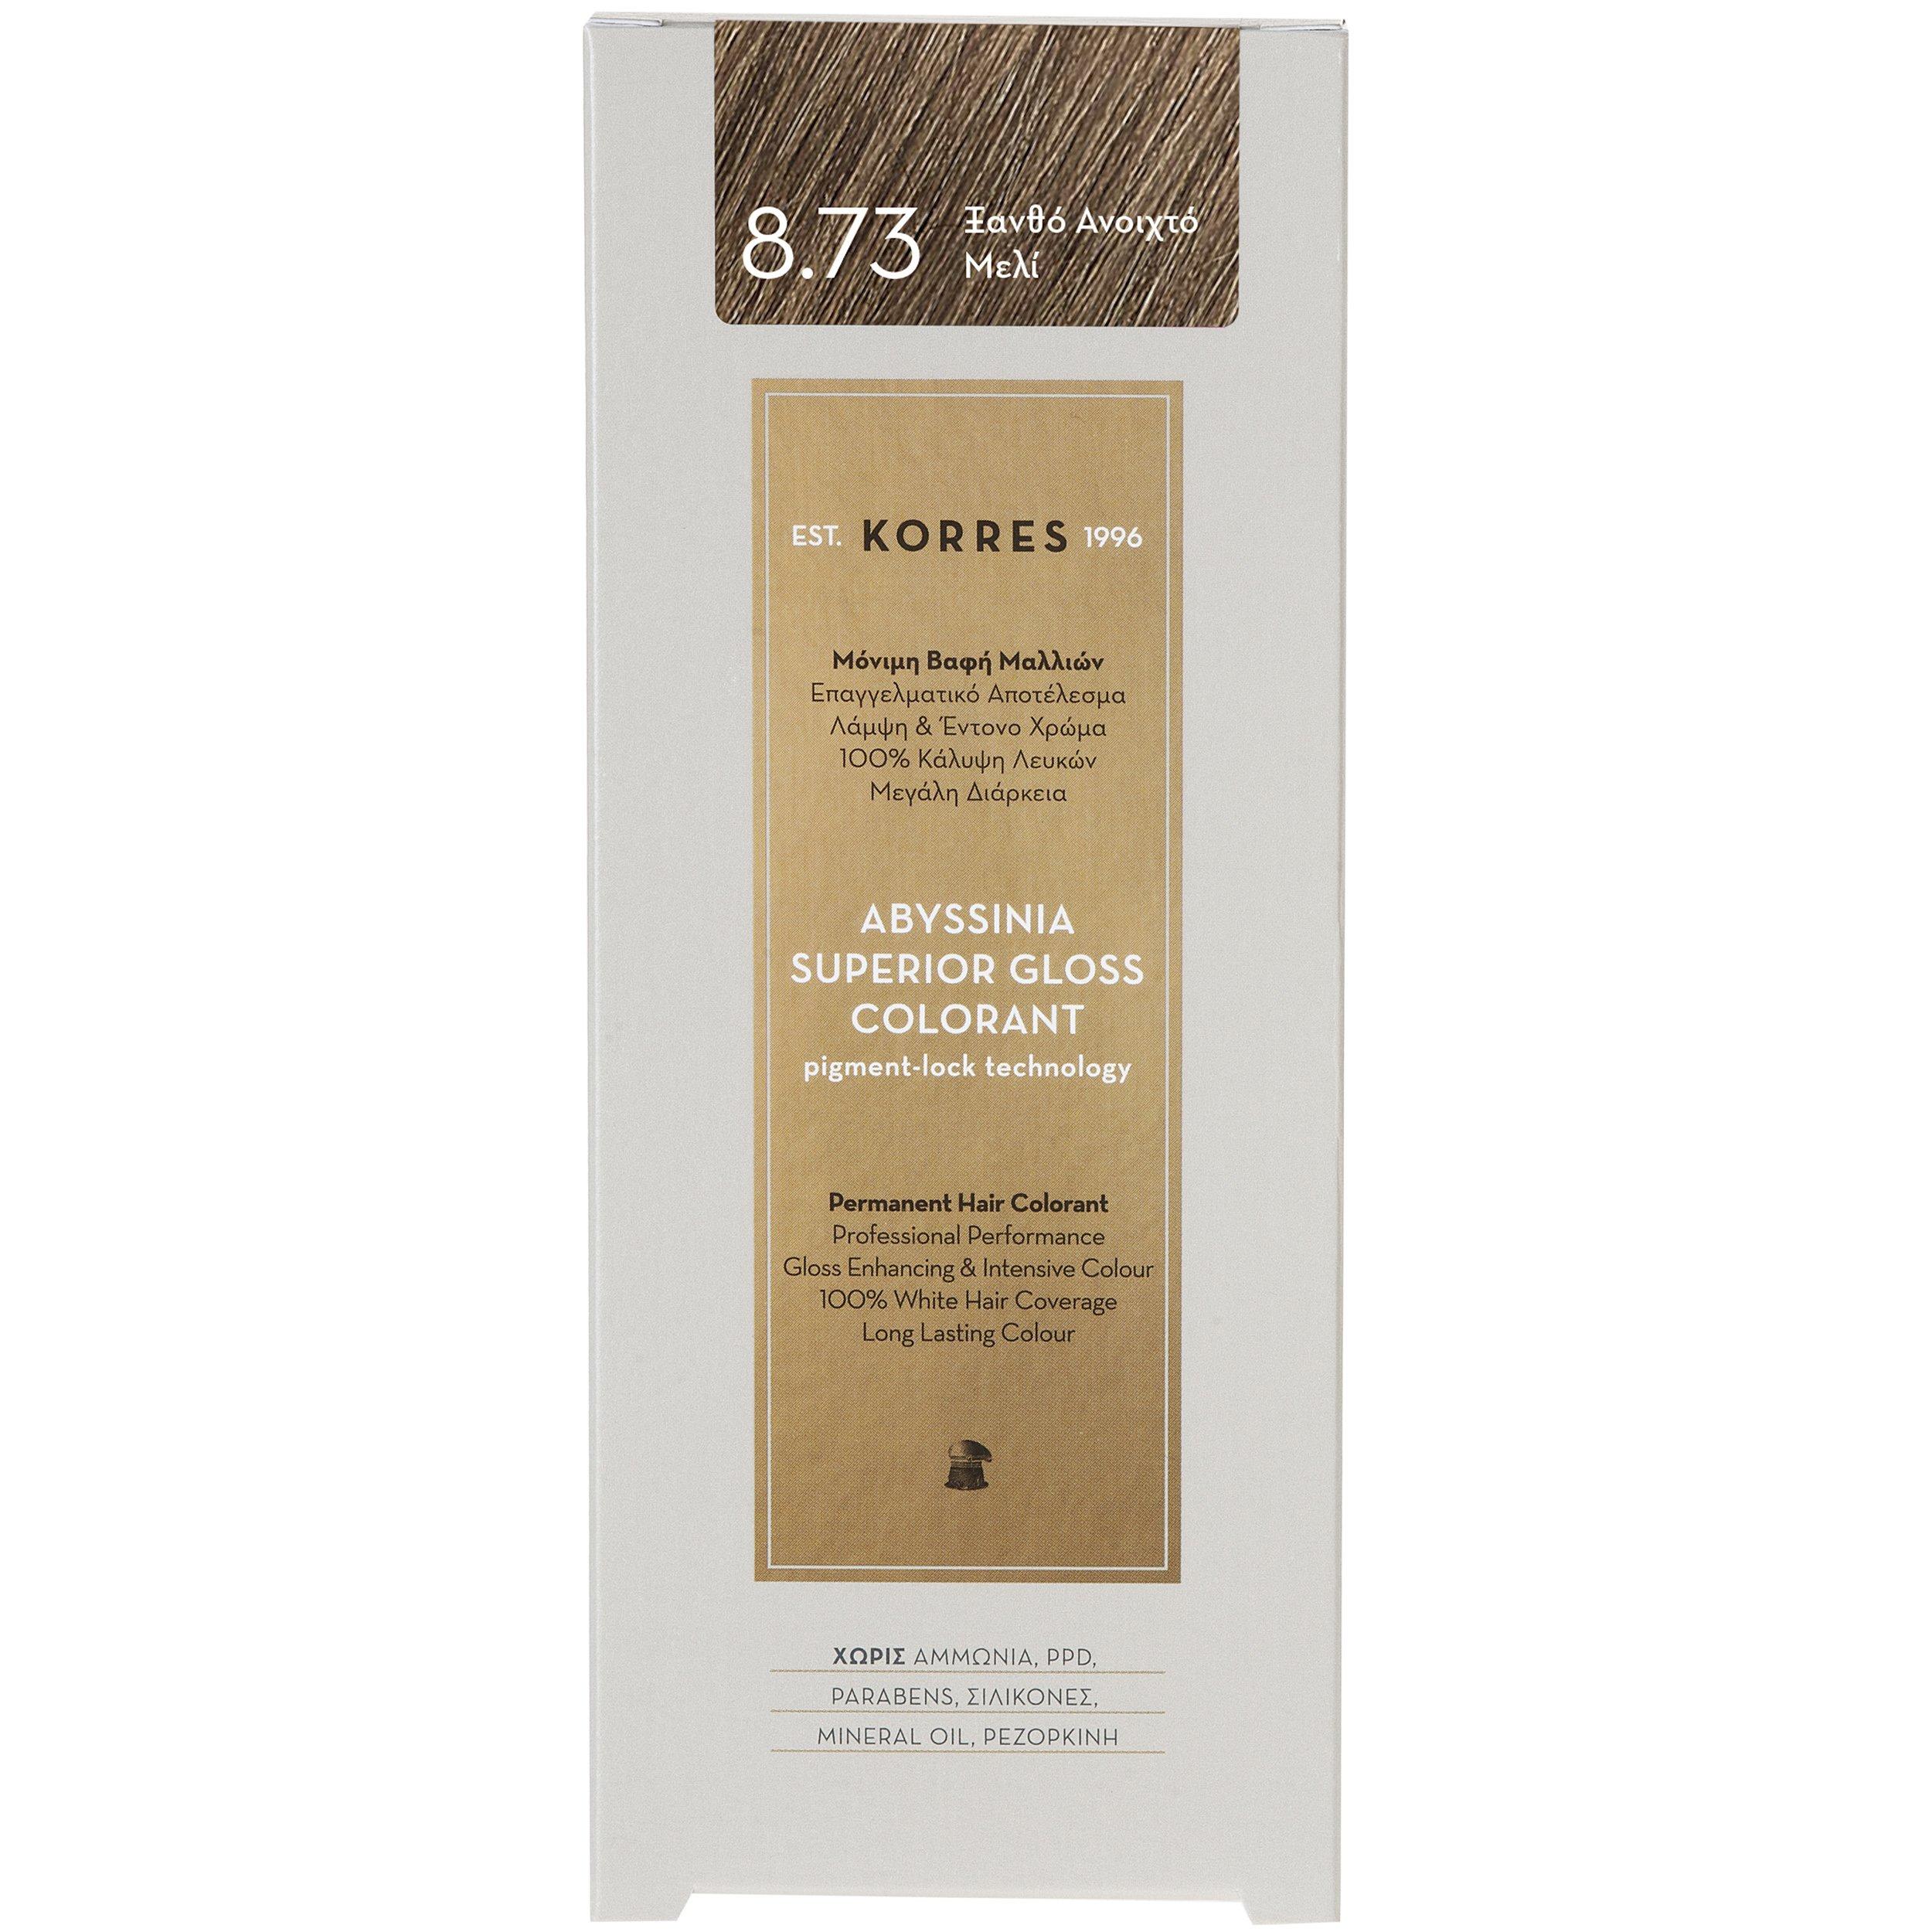 Korres Abyssinia Superior Gloss Colorant Επαγγελματικό Αποτέλεσμα Λάμψη & Έντονο Χρώμα – 8.73 ΞΑΝΘΟ ΑΝΟΙΧΤΟ ΜΕΛΙ